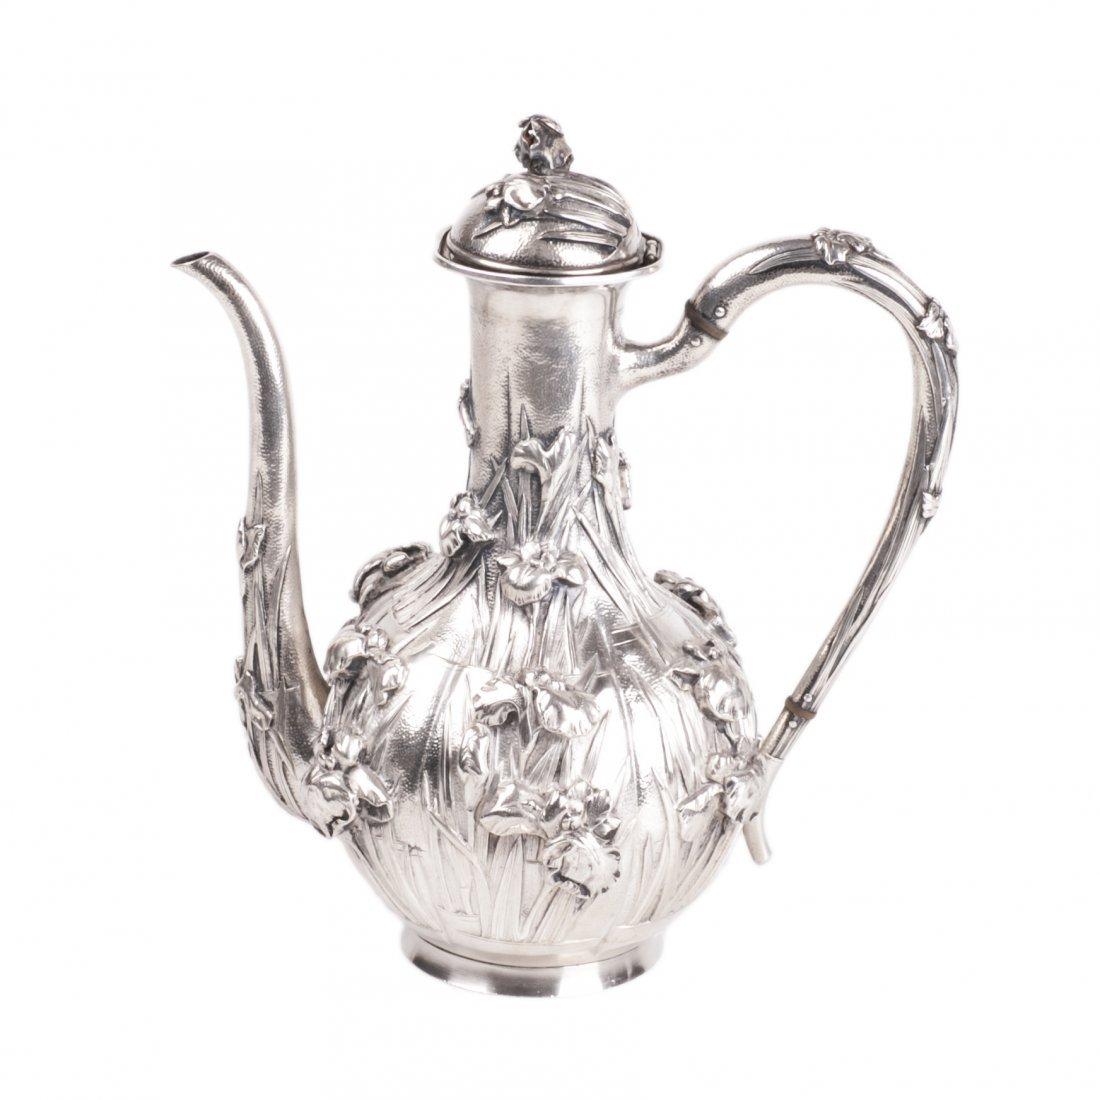 Antique Japan silver coffee pot with flower motifs